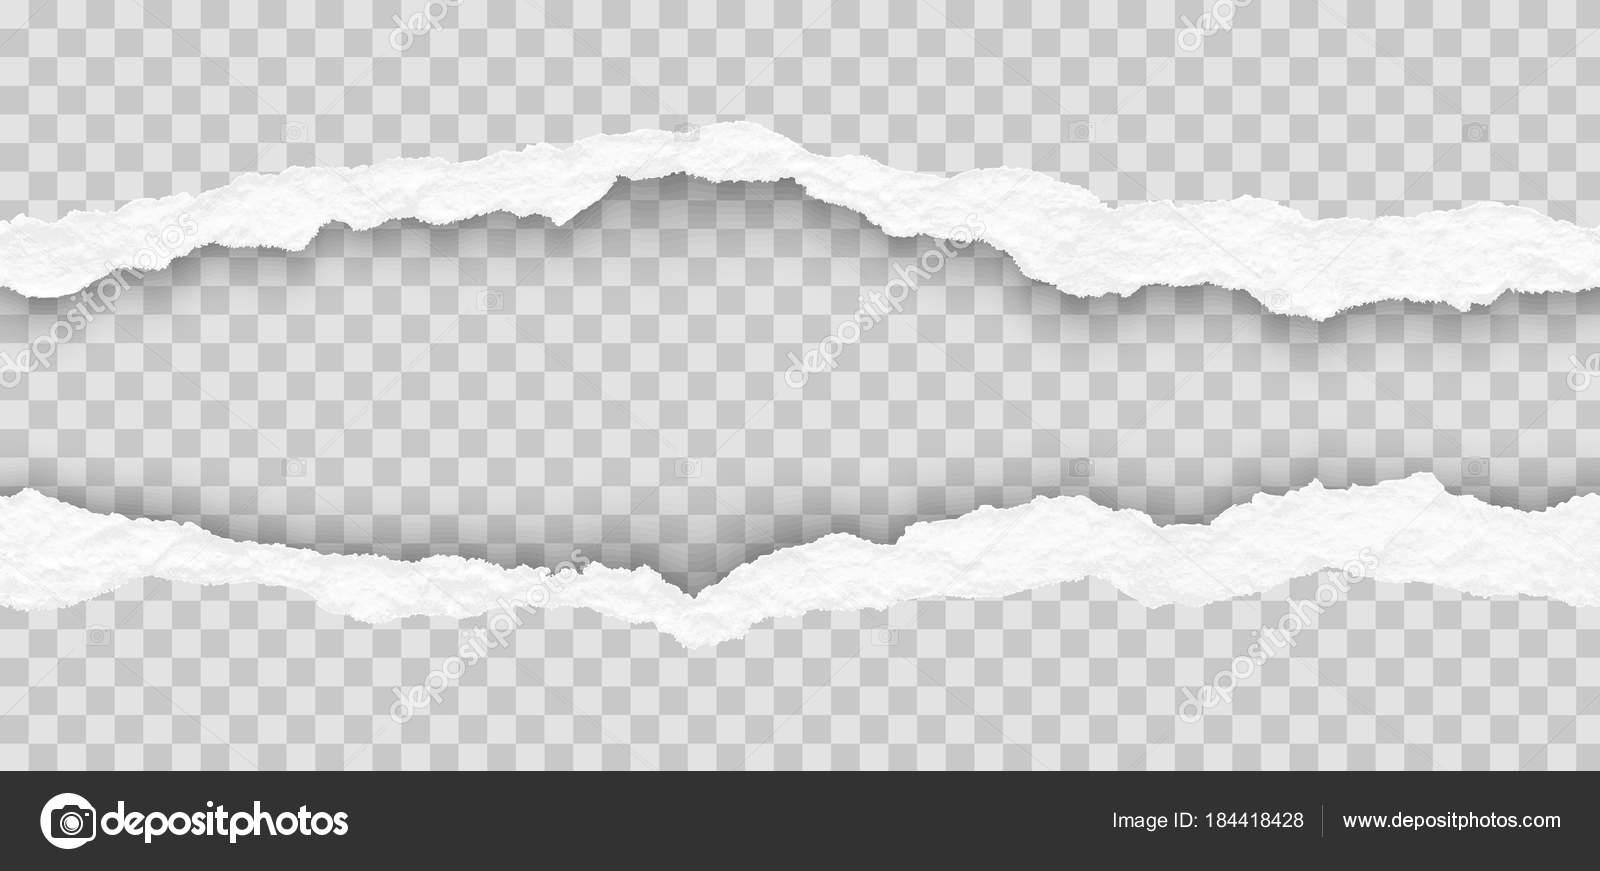 Seamless Torn Paper Edges Vector Illustration \u2014 Stock Vector © swavo